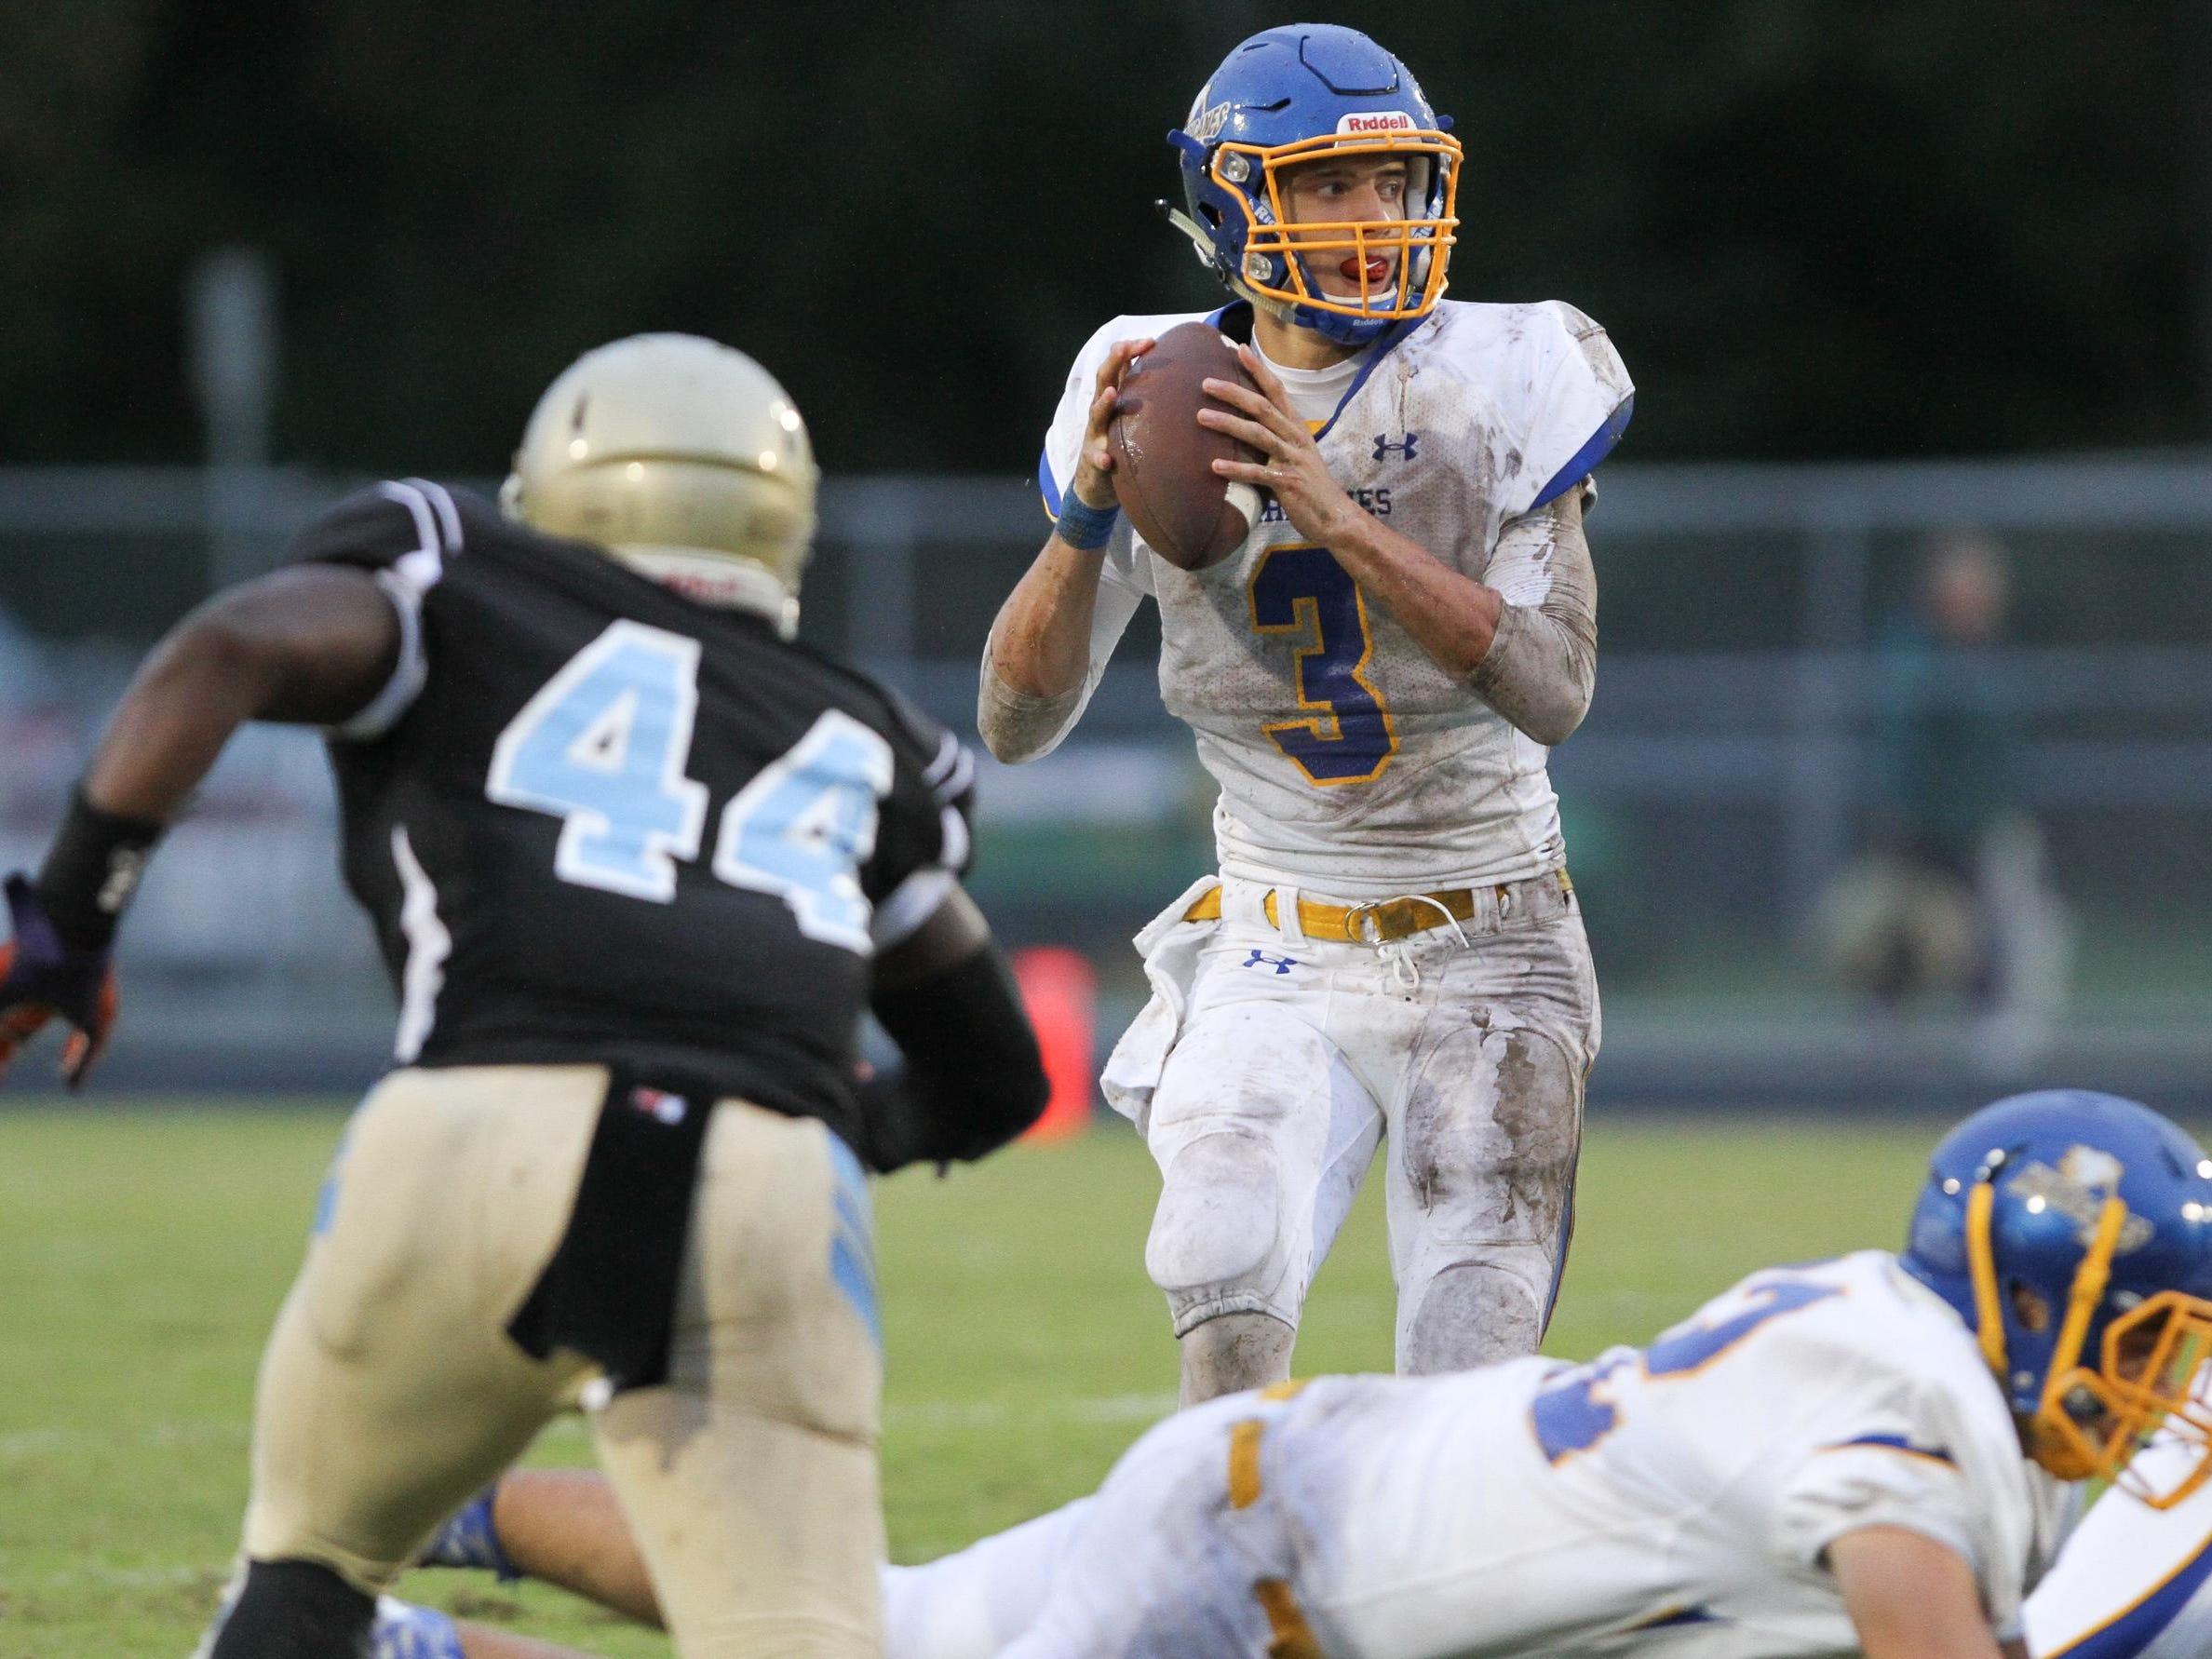 Wren quarterback Jay Urich (3) looks to pass against Daniel friday night at Daniel High School, October 2, 2015.